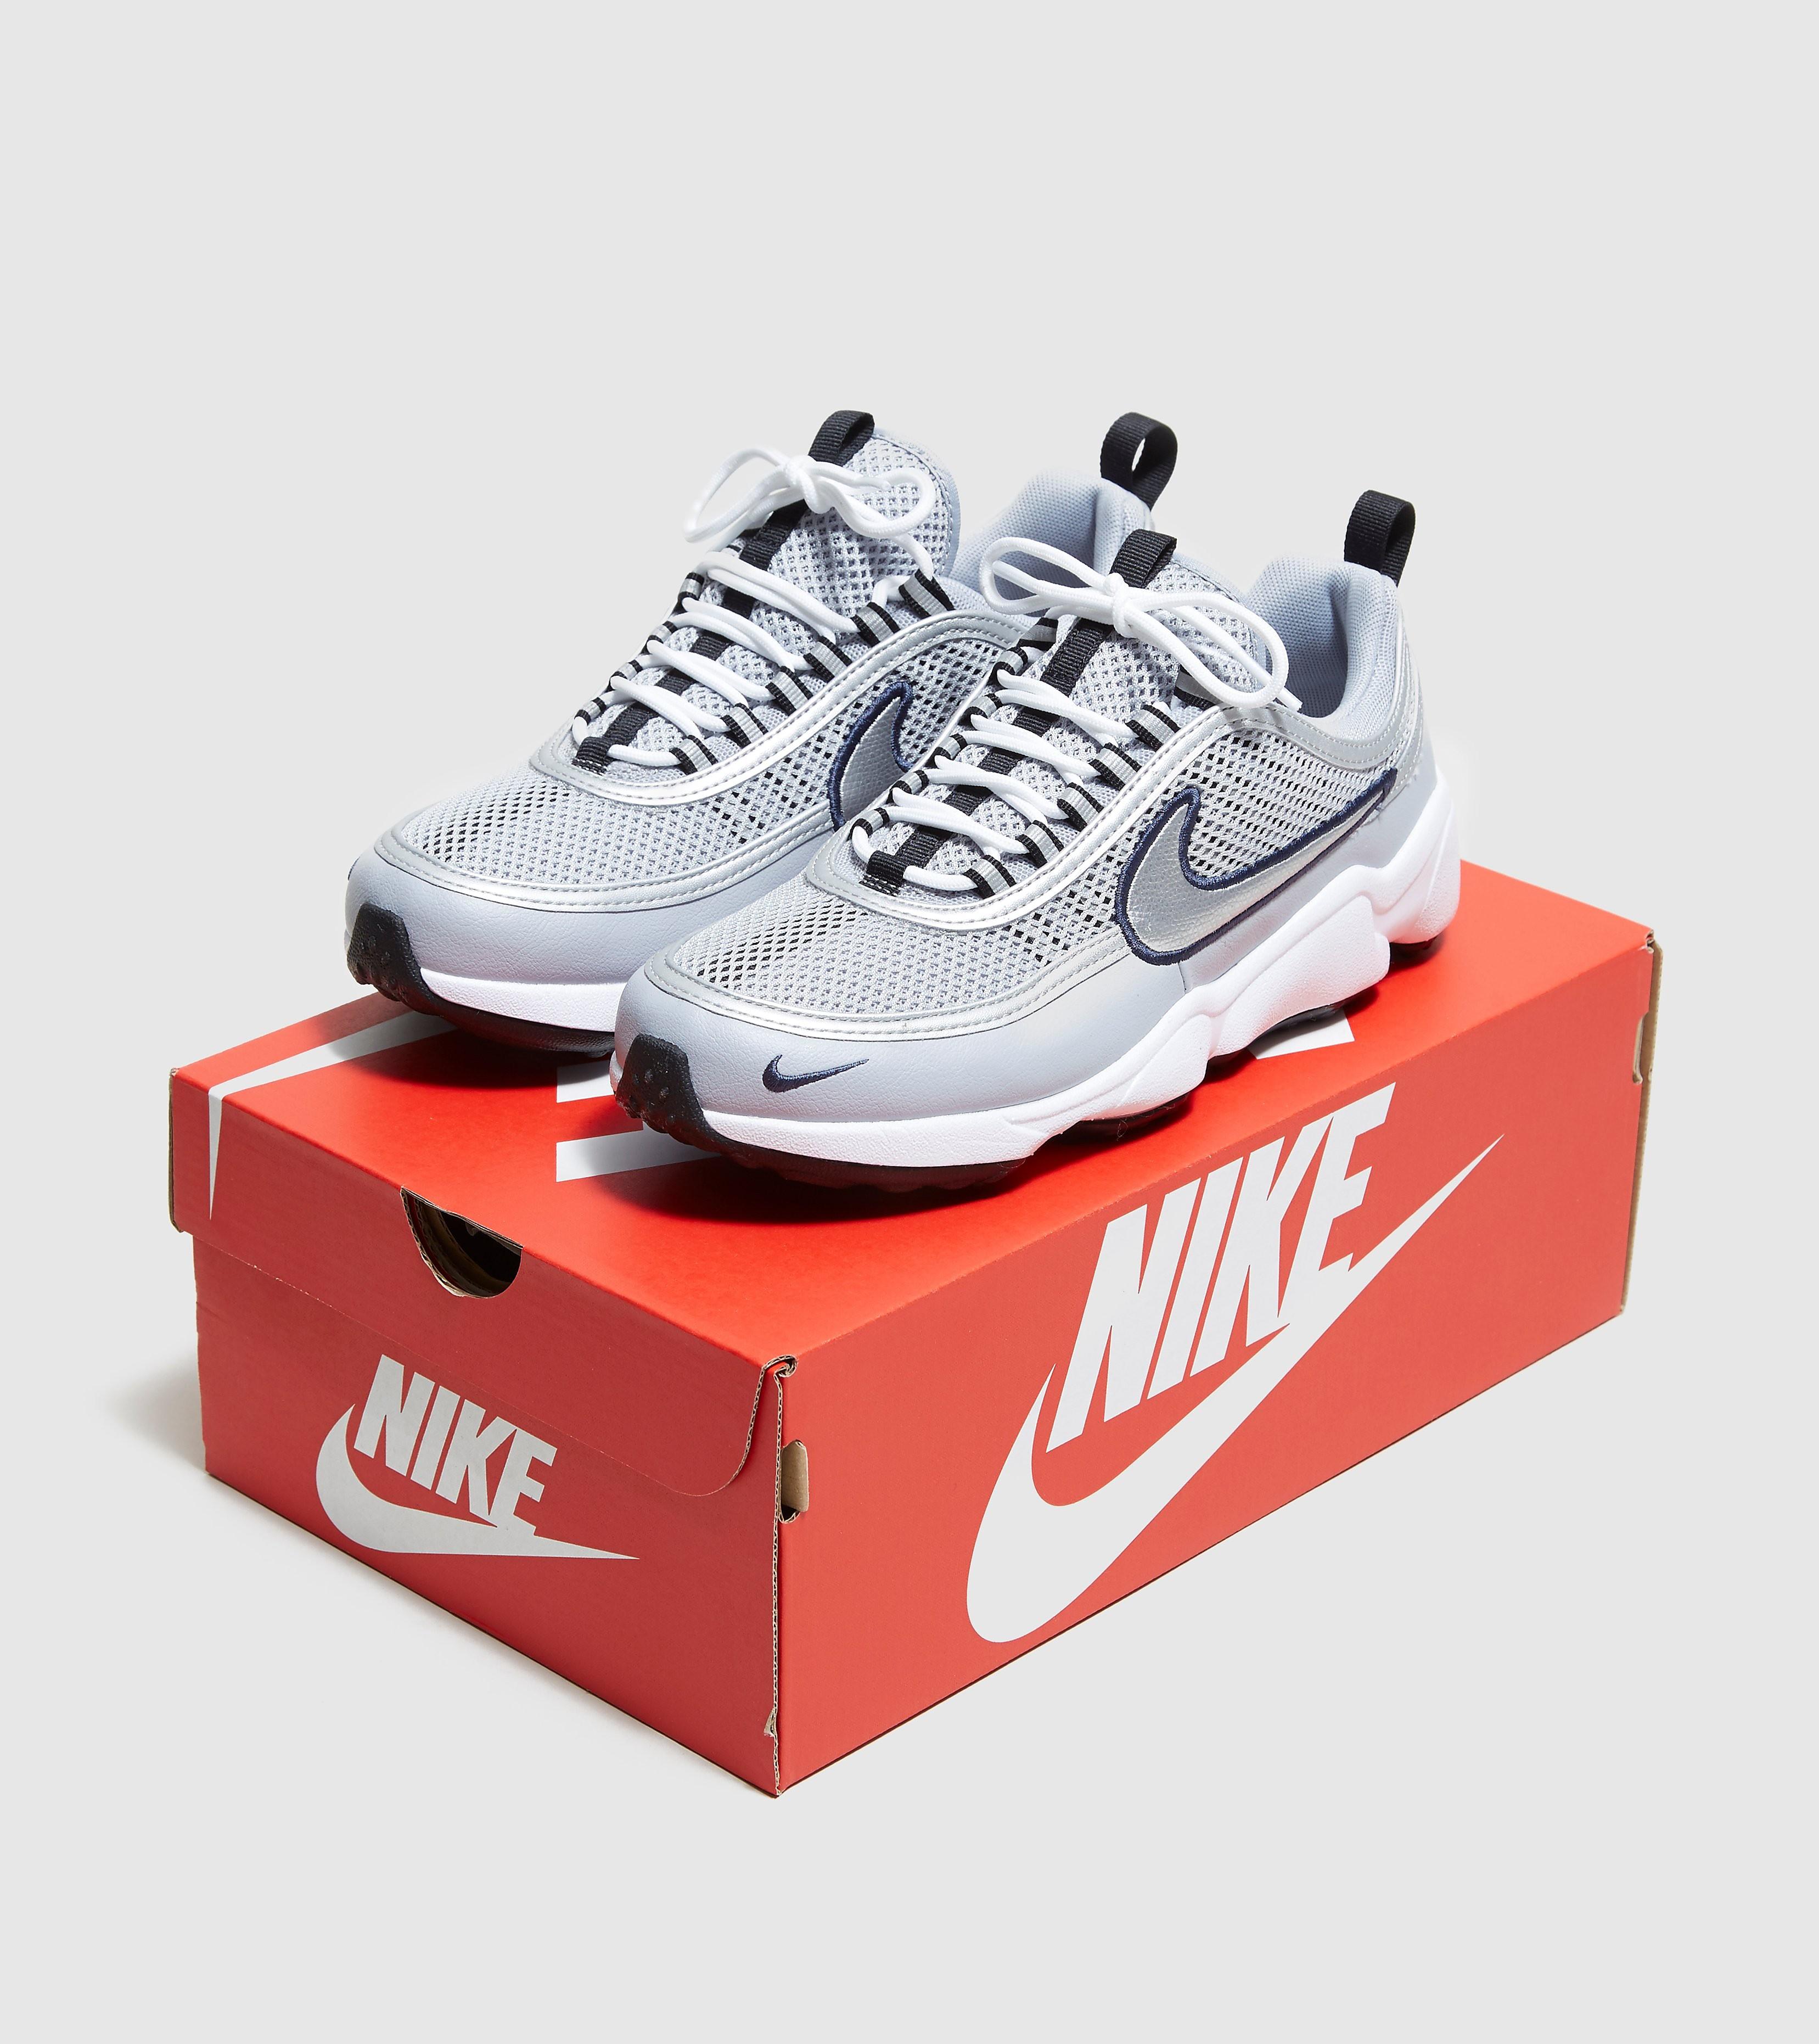 Nike Air Zoom Spiridon Ultra Women's